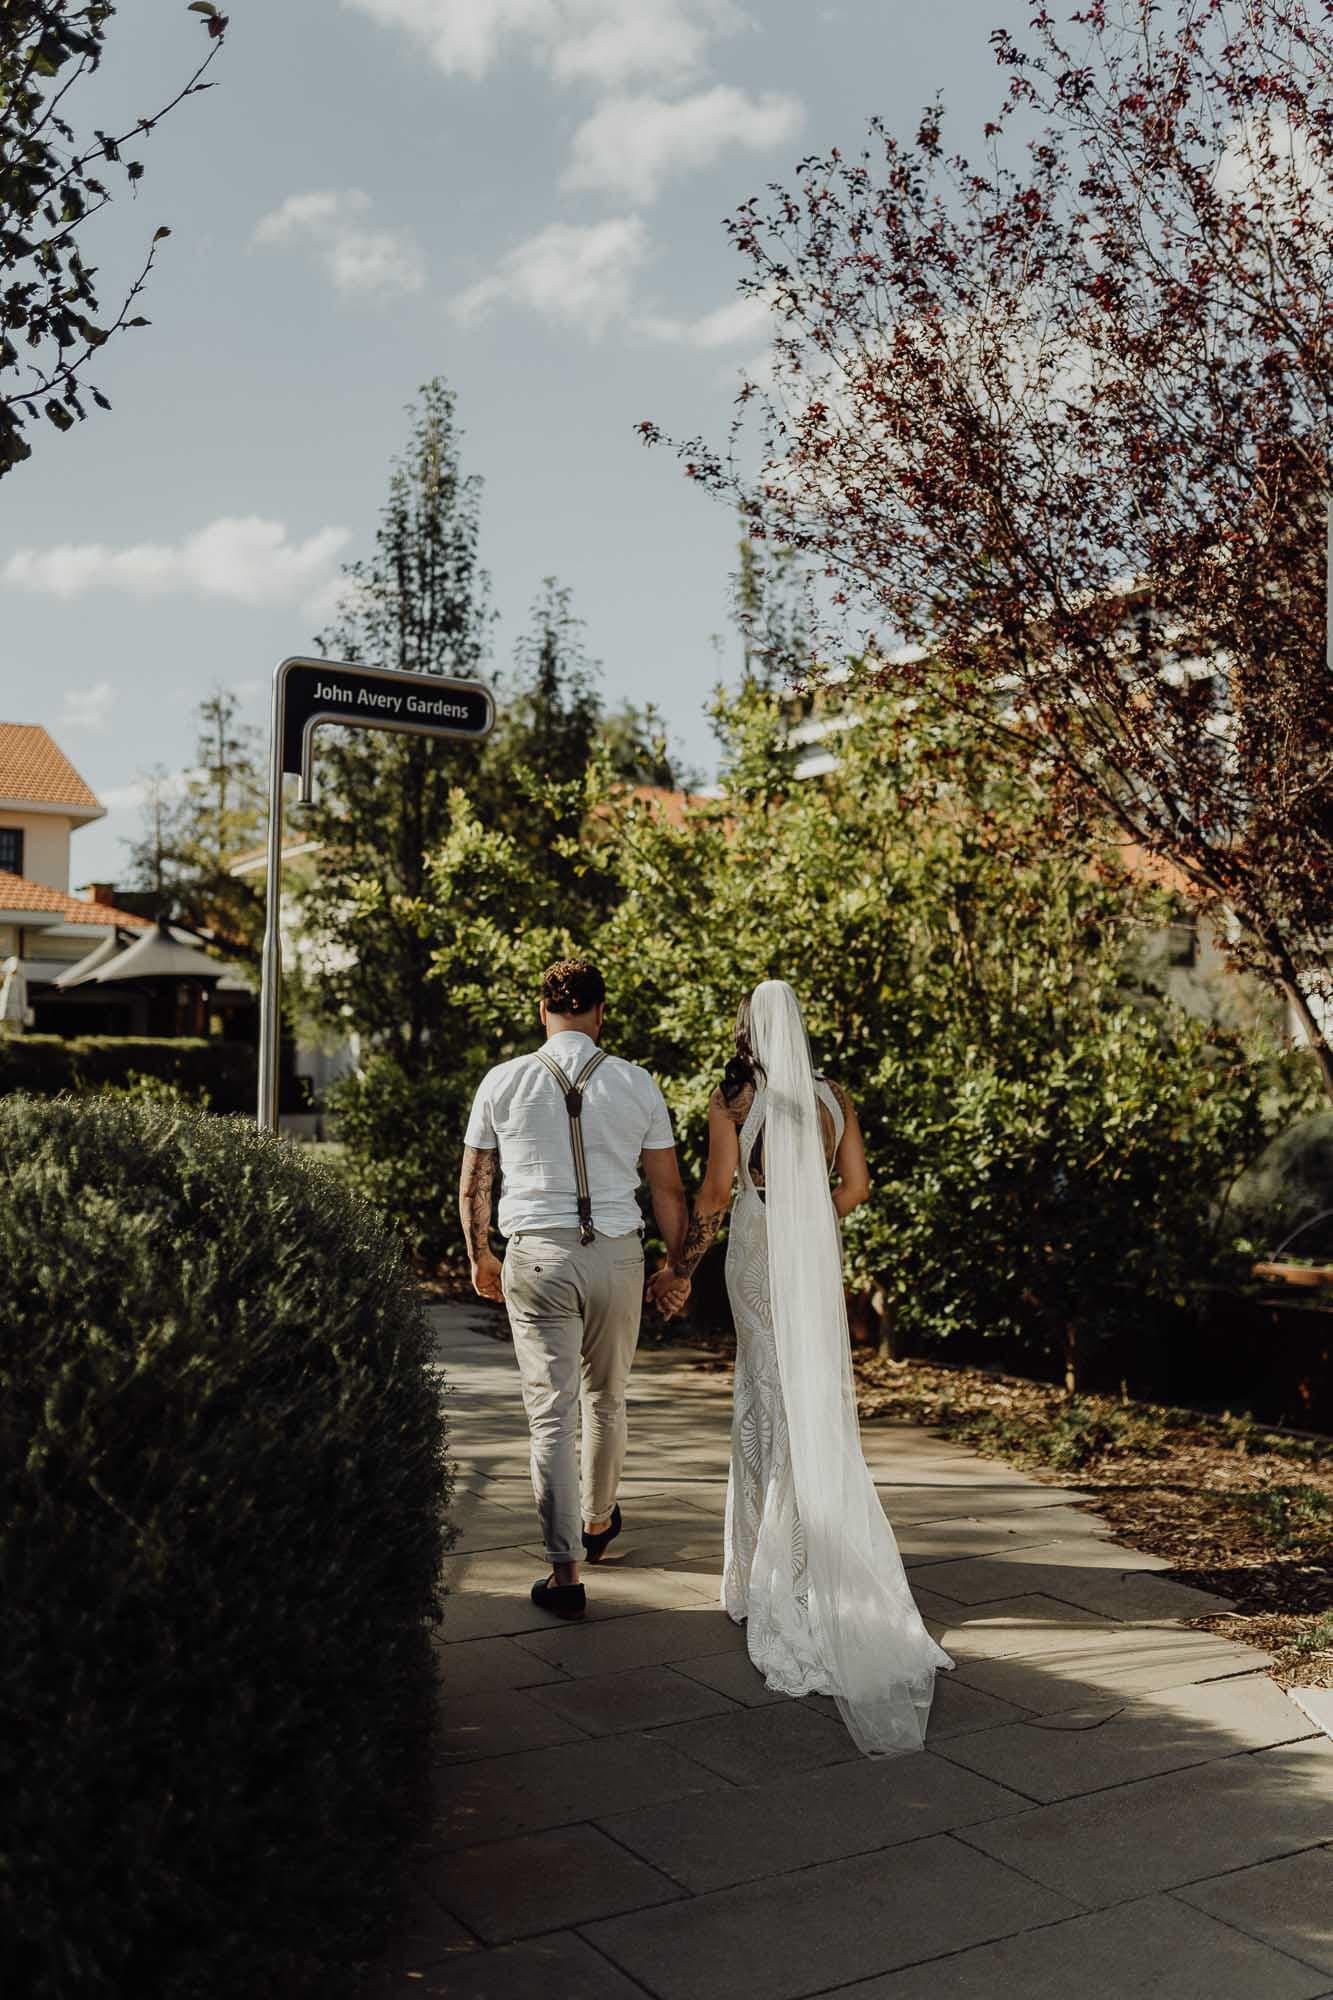 Urban wedding